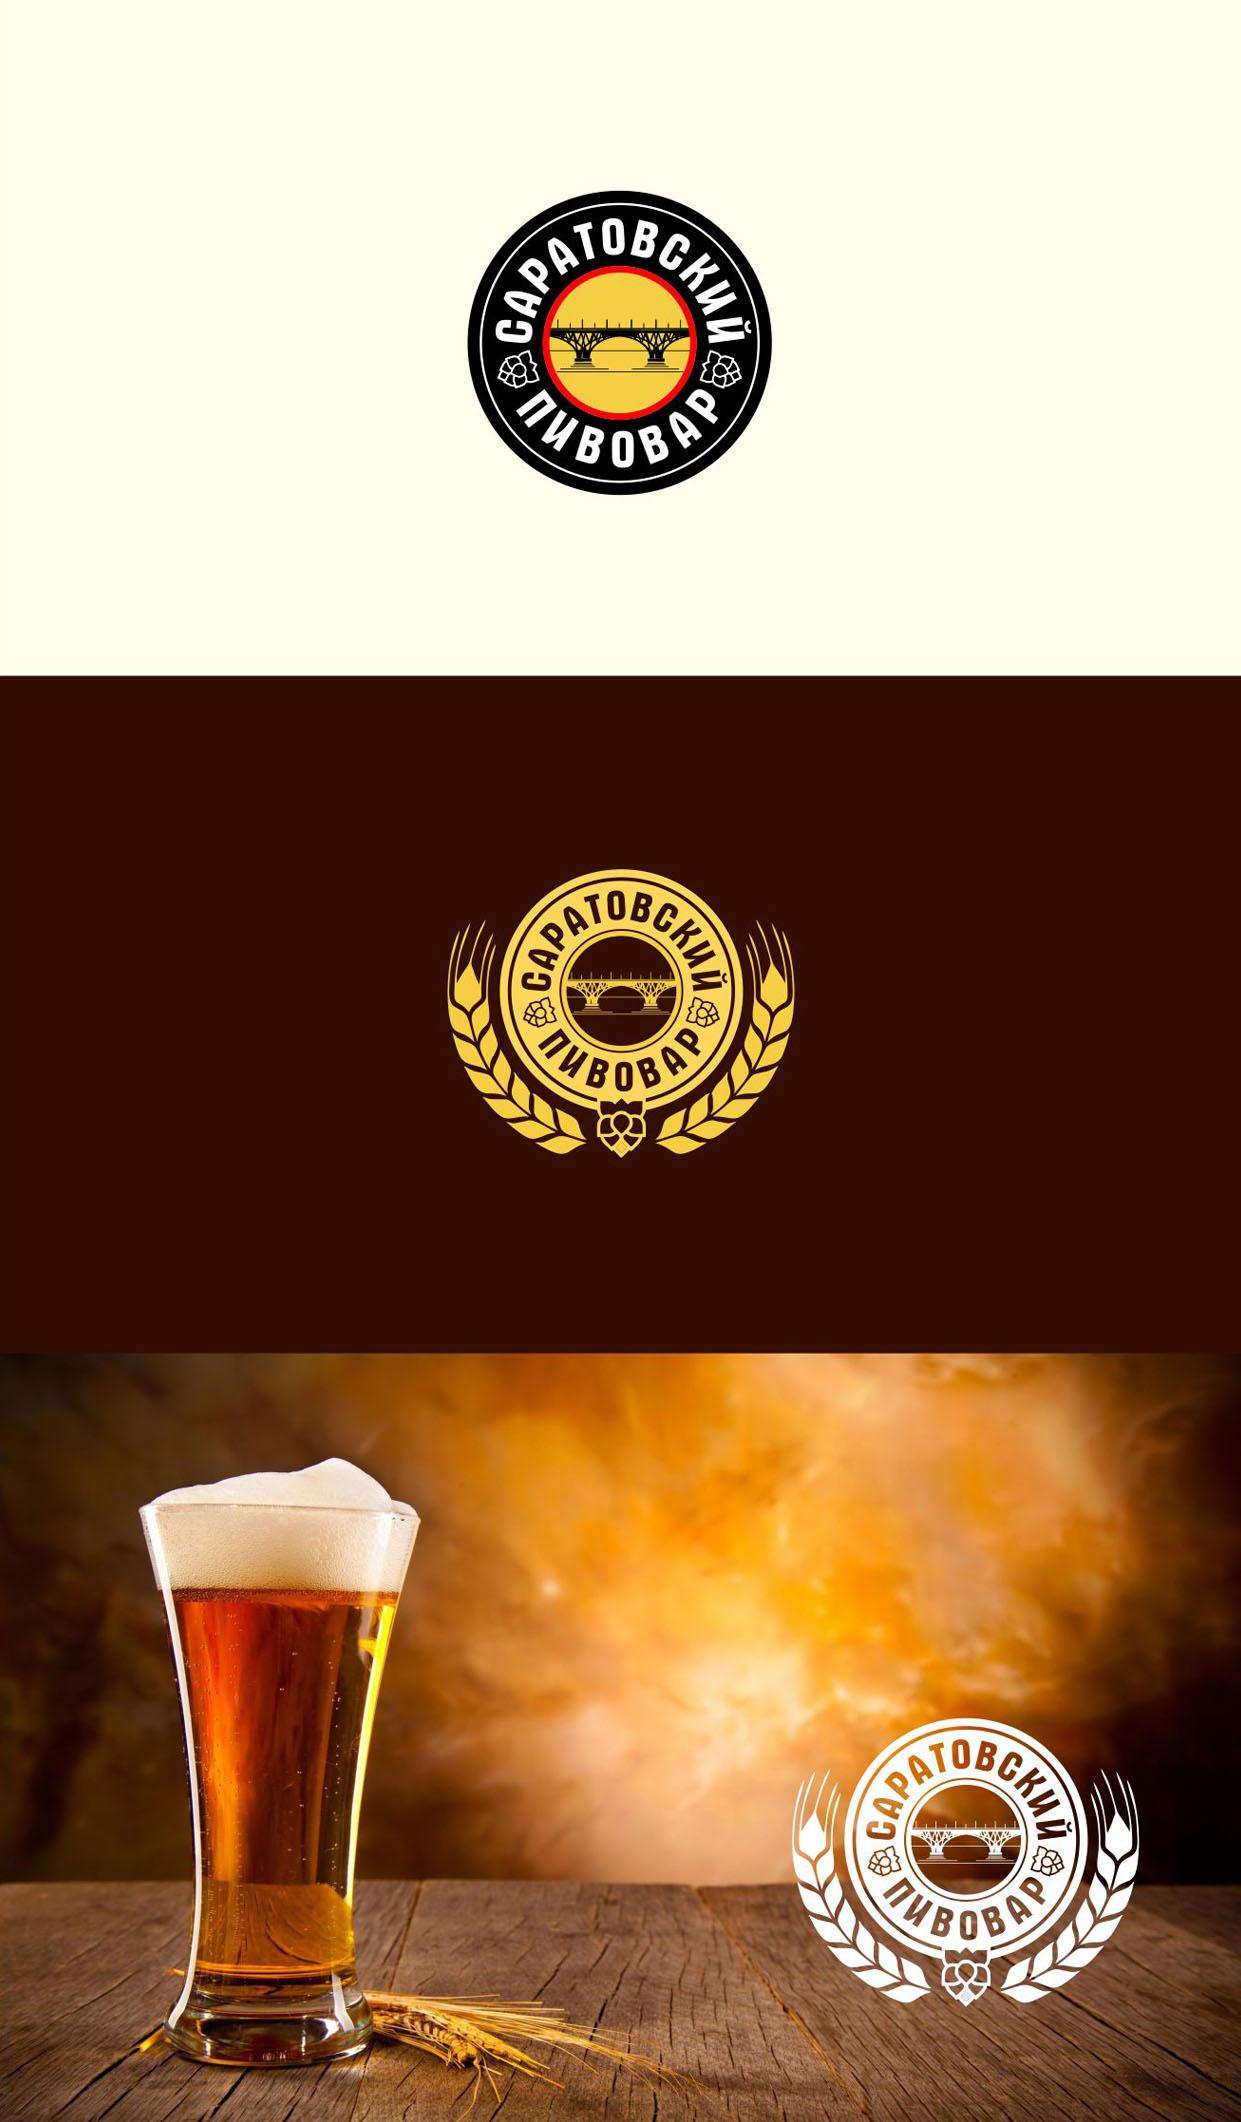 Разработка логотипа для частной пивоварни фото f_7095d77a85b6f5f7.jpg